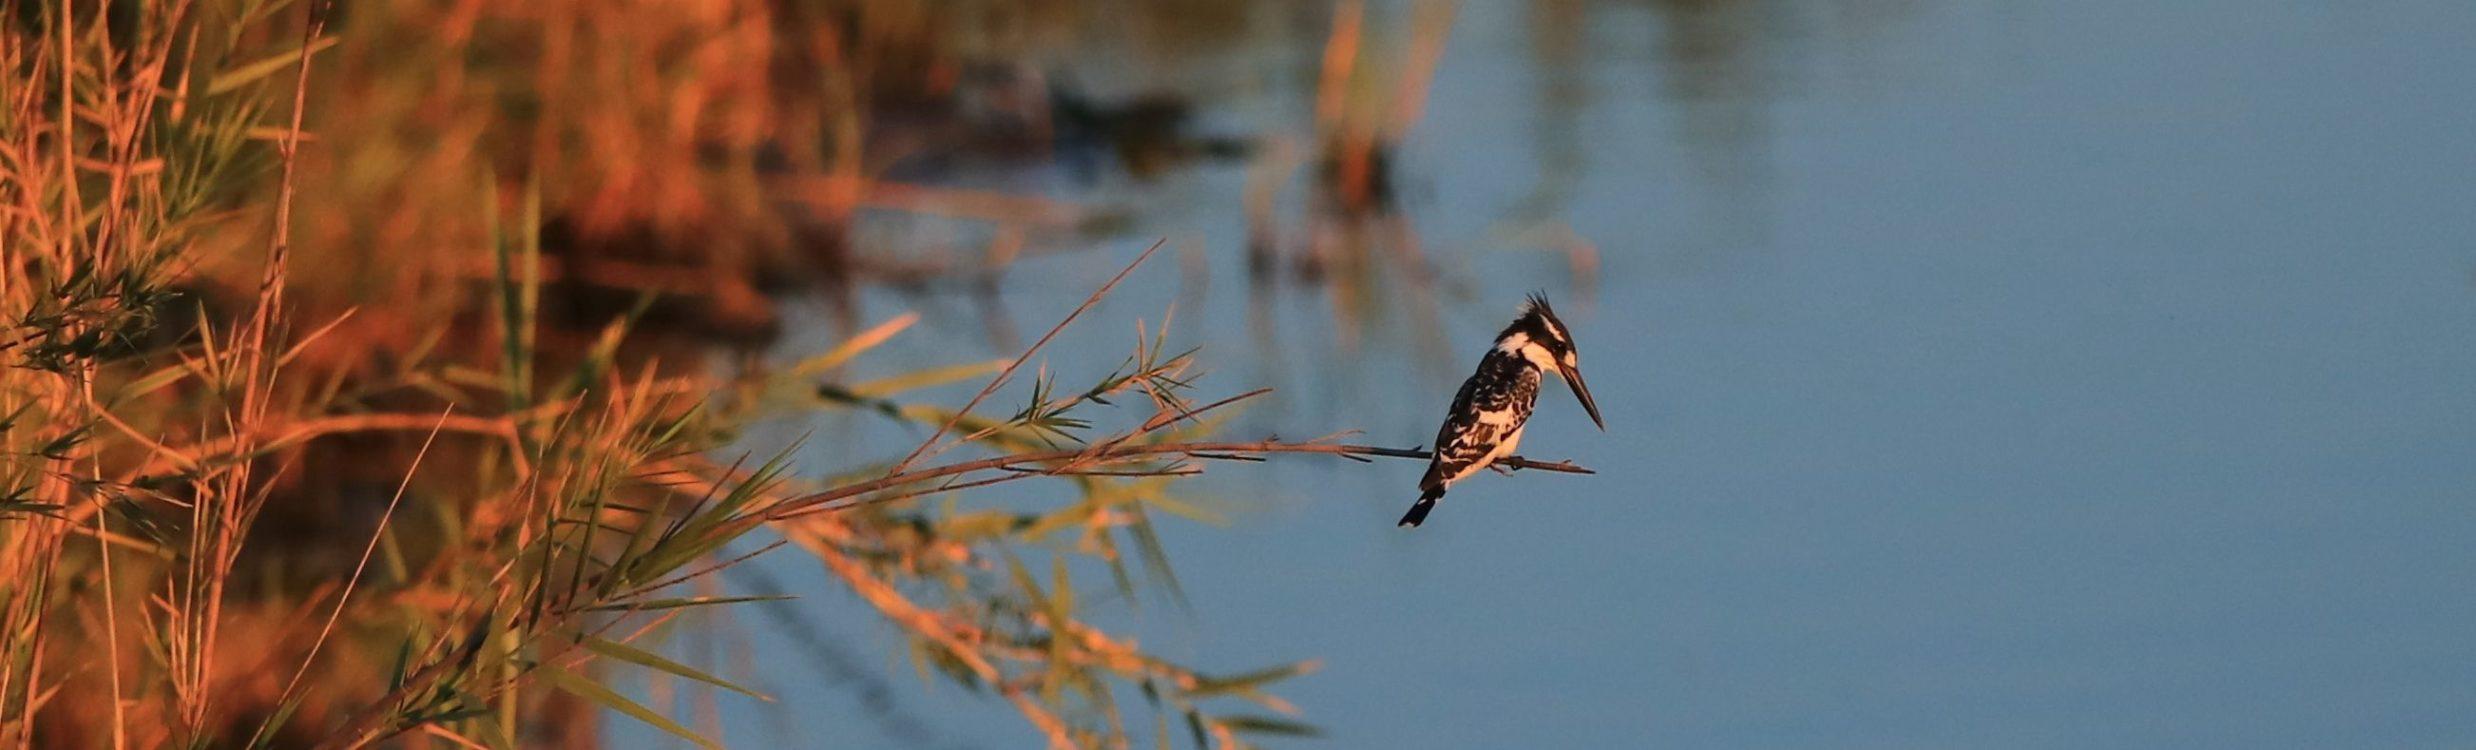 Botswana, Chobe River ©Horst Reitz